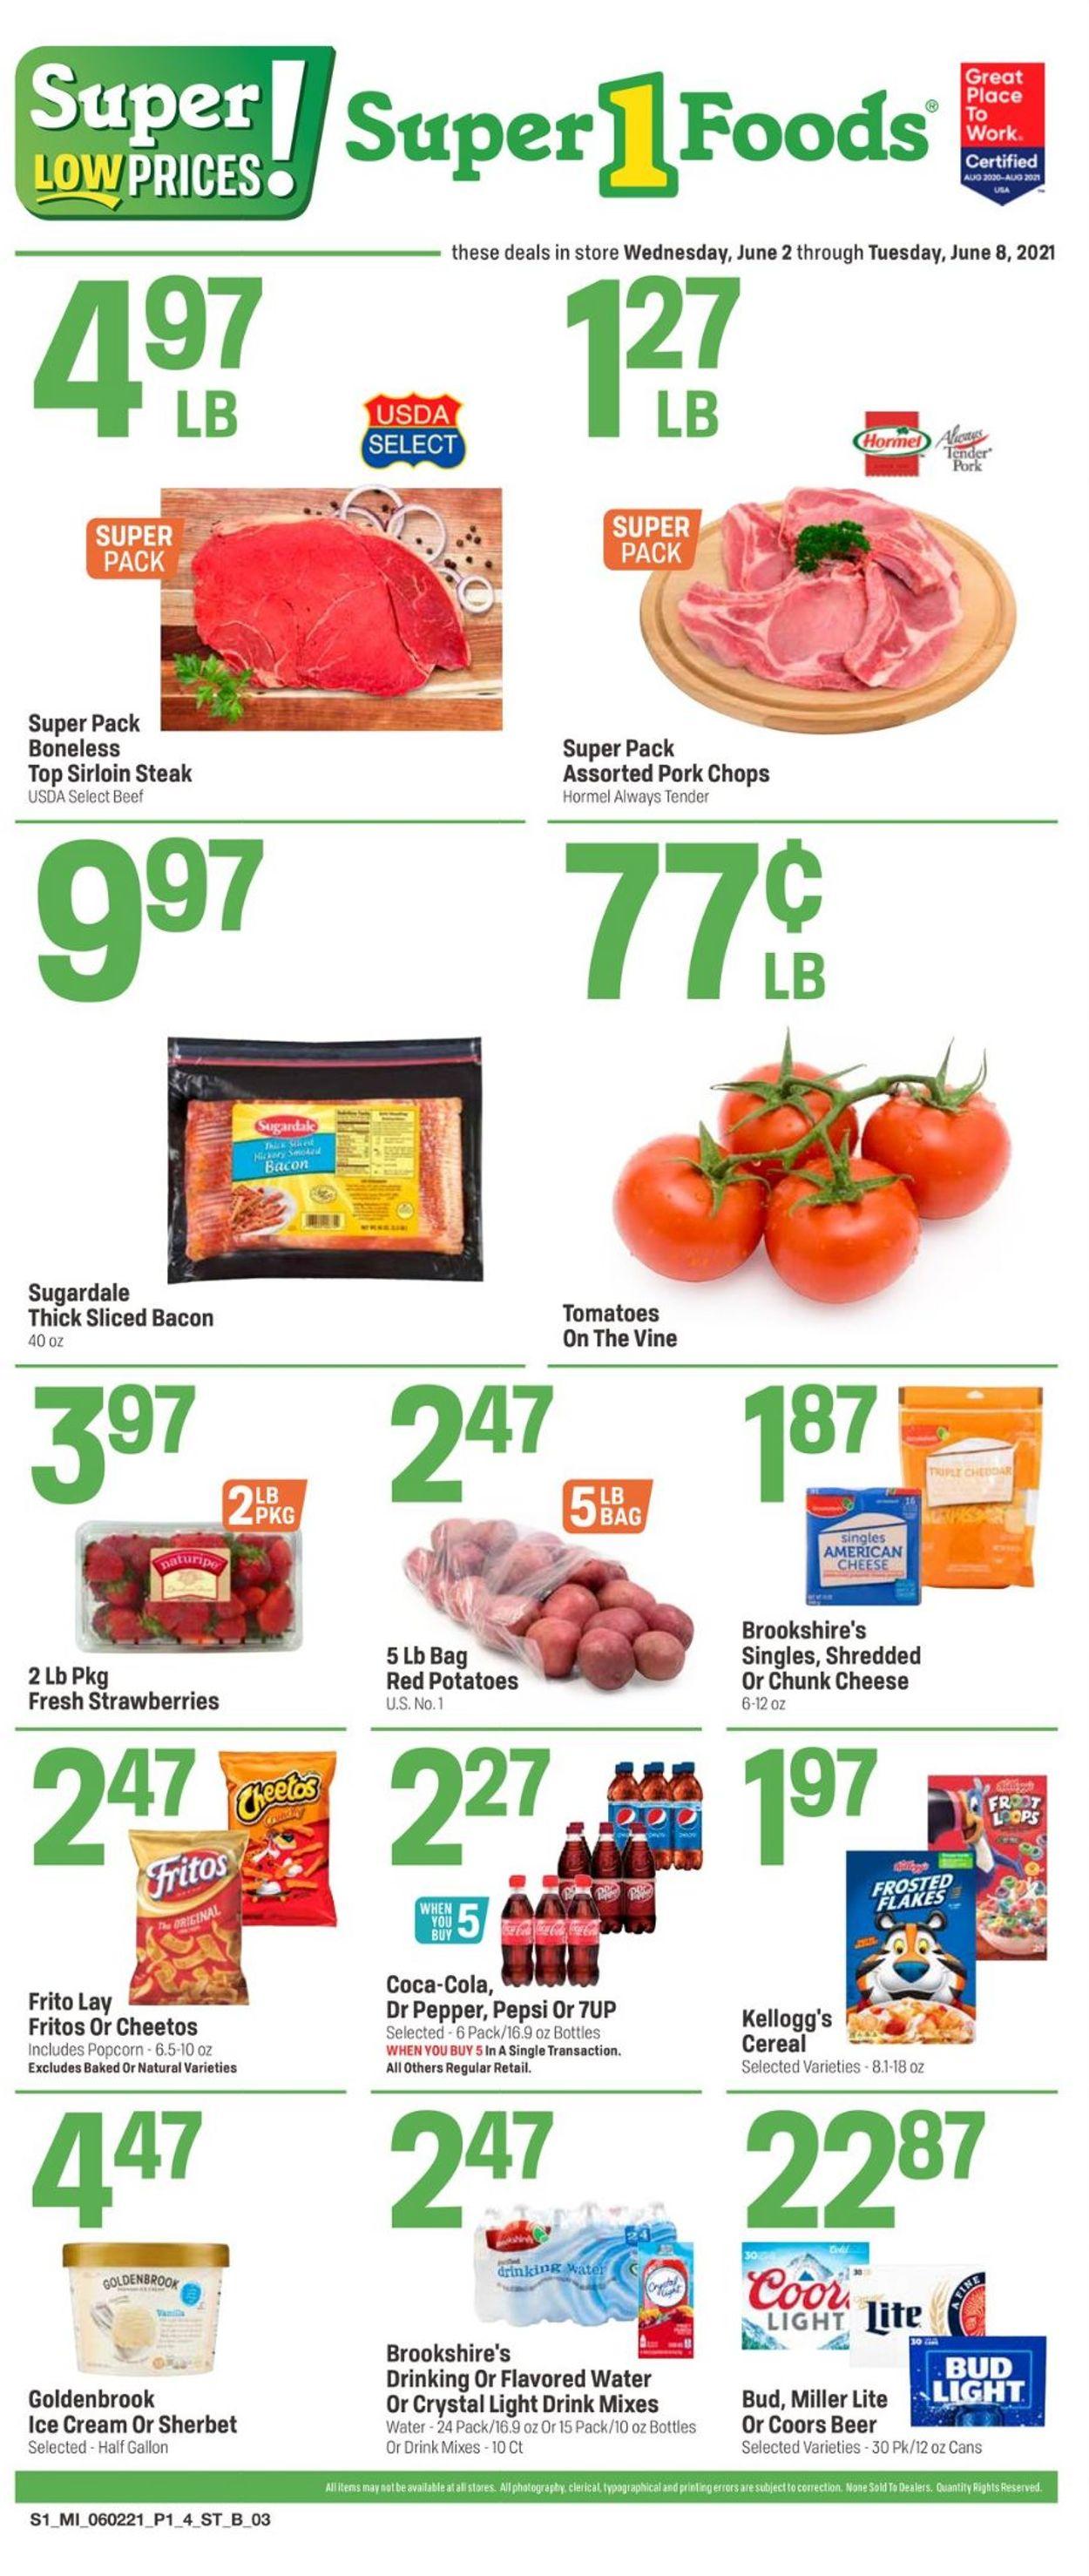 Super 1 Foods Weekly Ad Circular - valid 06/02-06/08/2021